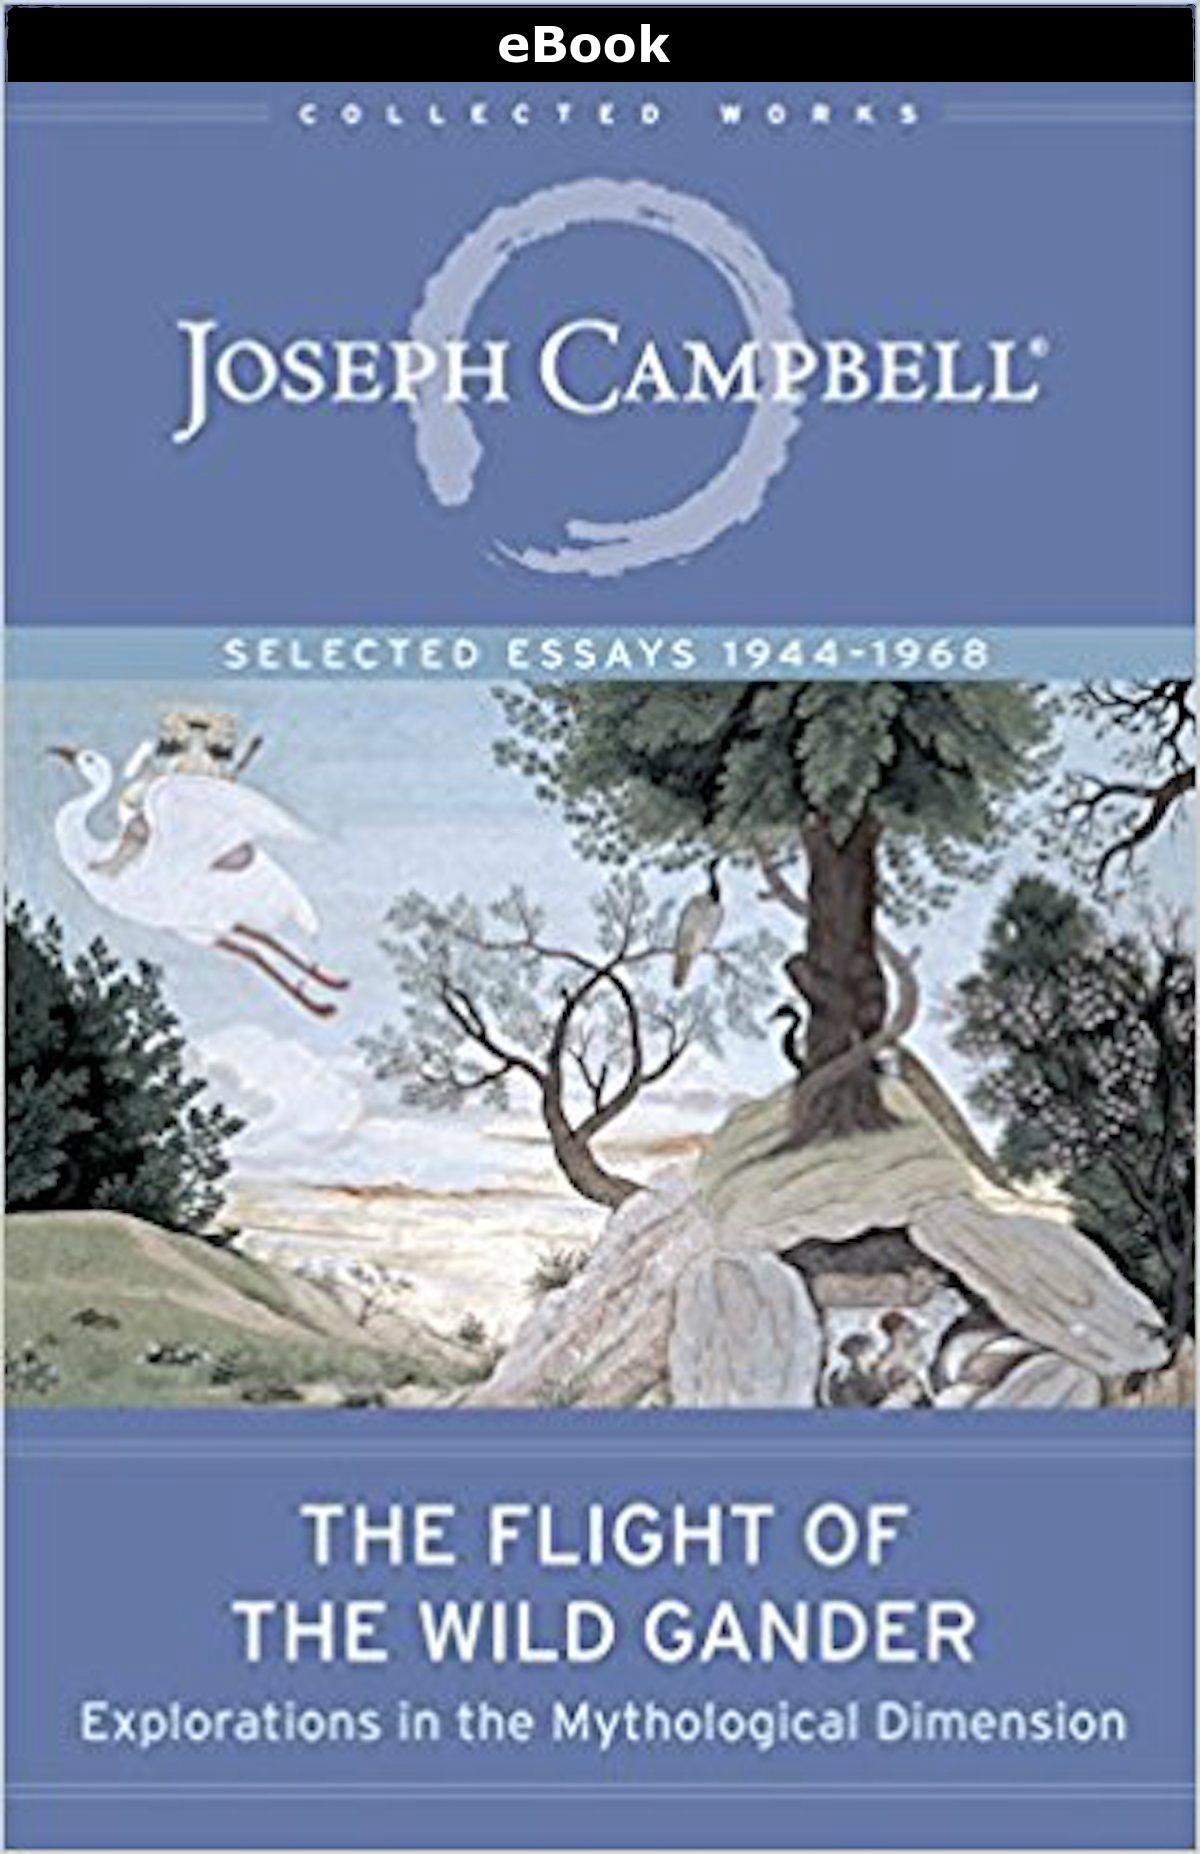 The Flight of the Wild Gander (Ebook)